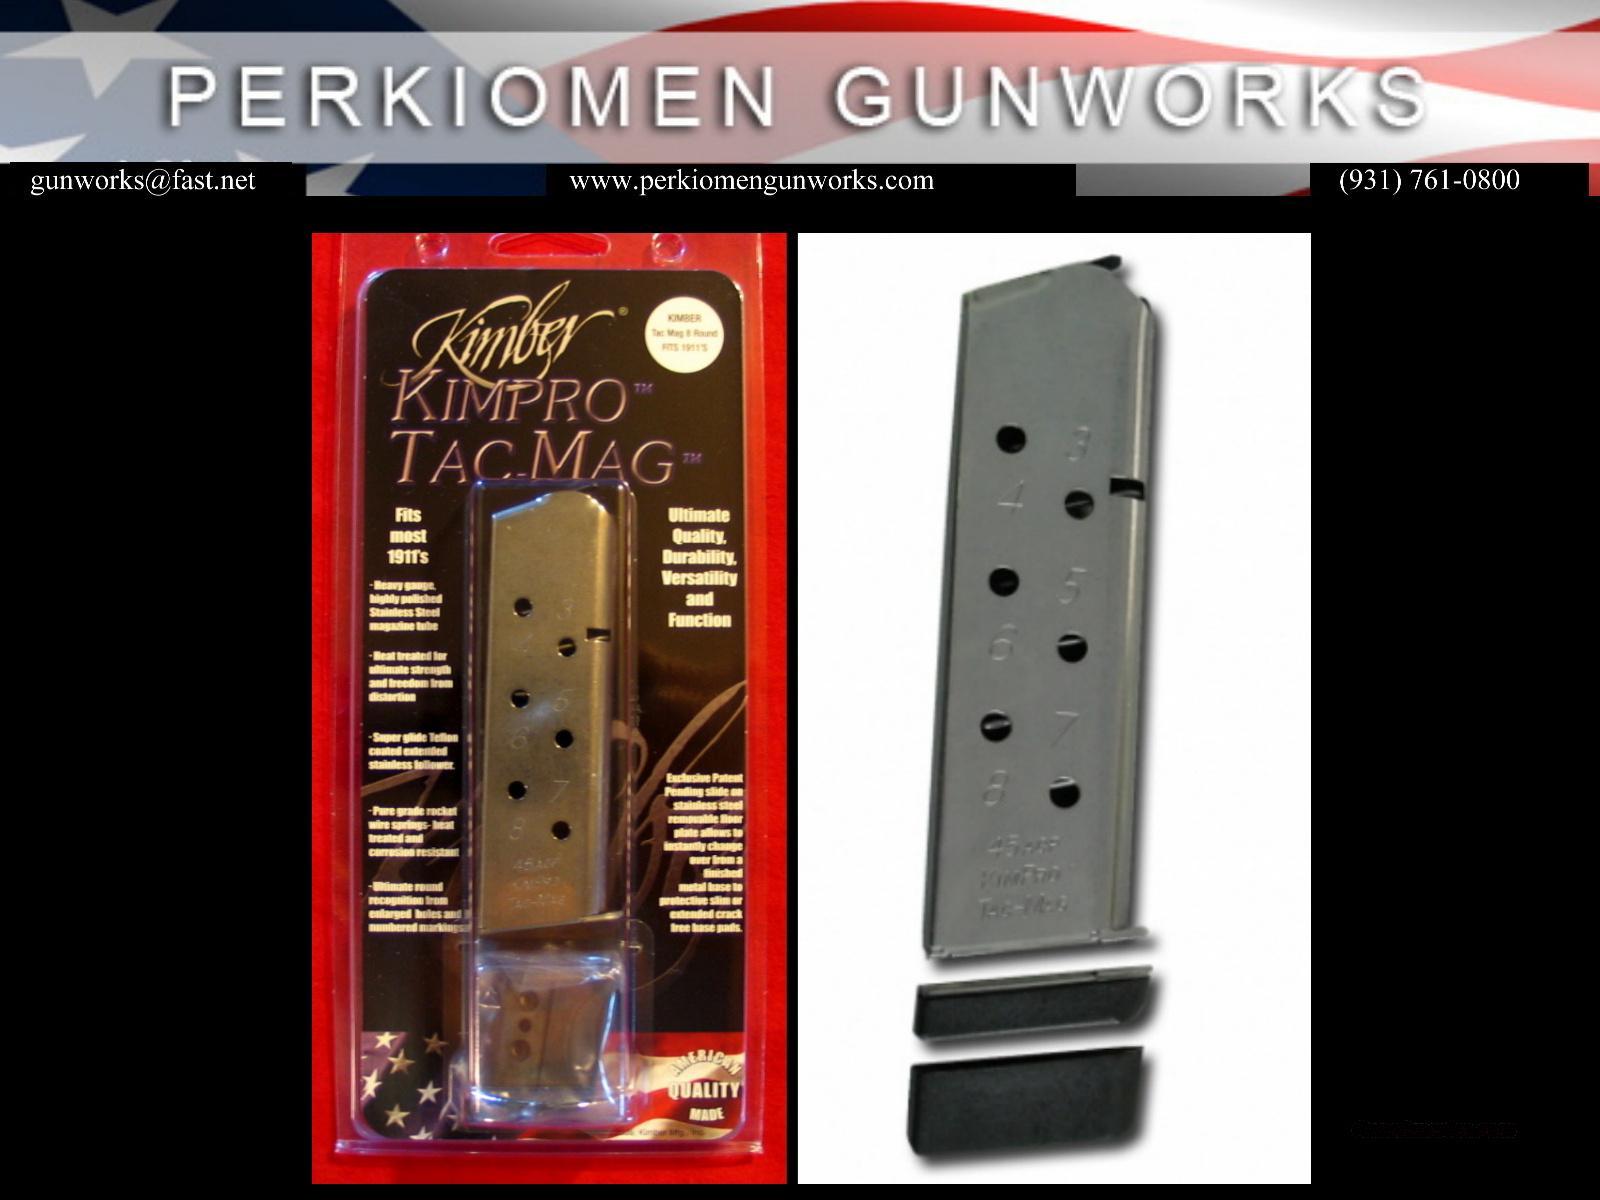 Kimber KimPro Tac-Mag, SS, Full size 45acp  Non-Guns > Magazines & Clips > Pistol Magazines > 1911